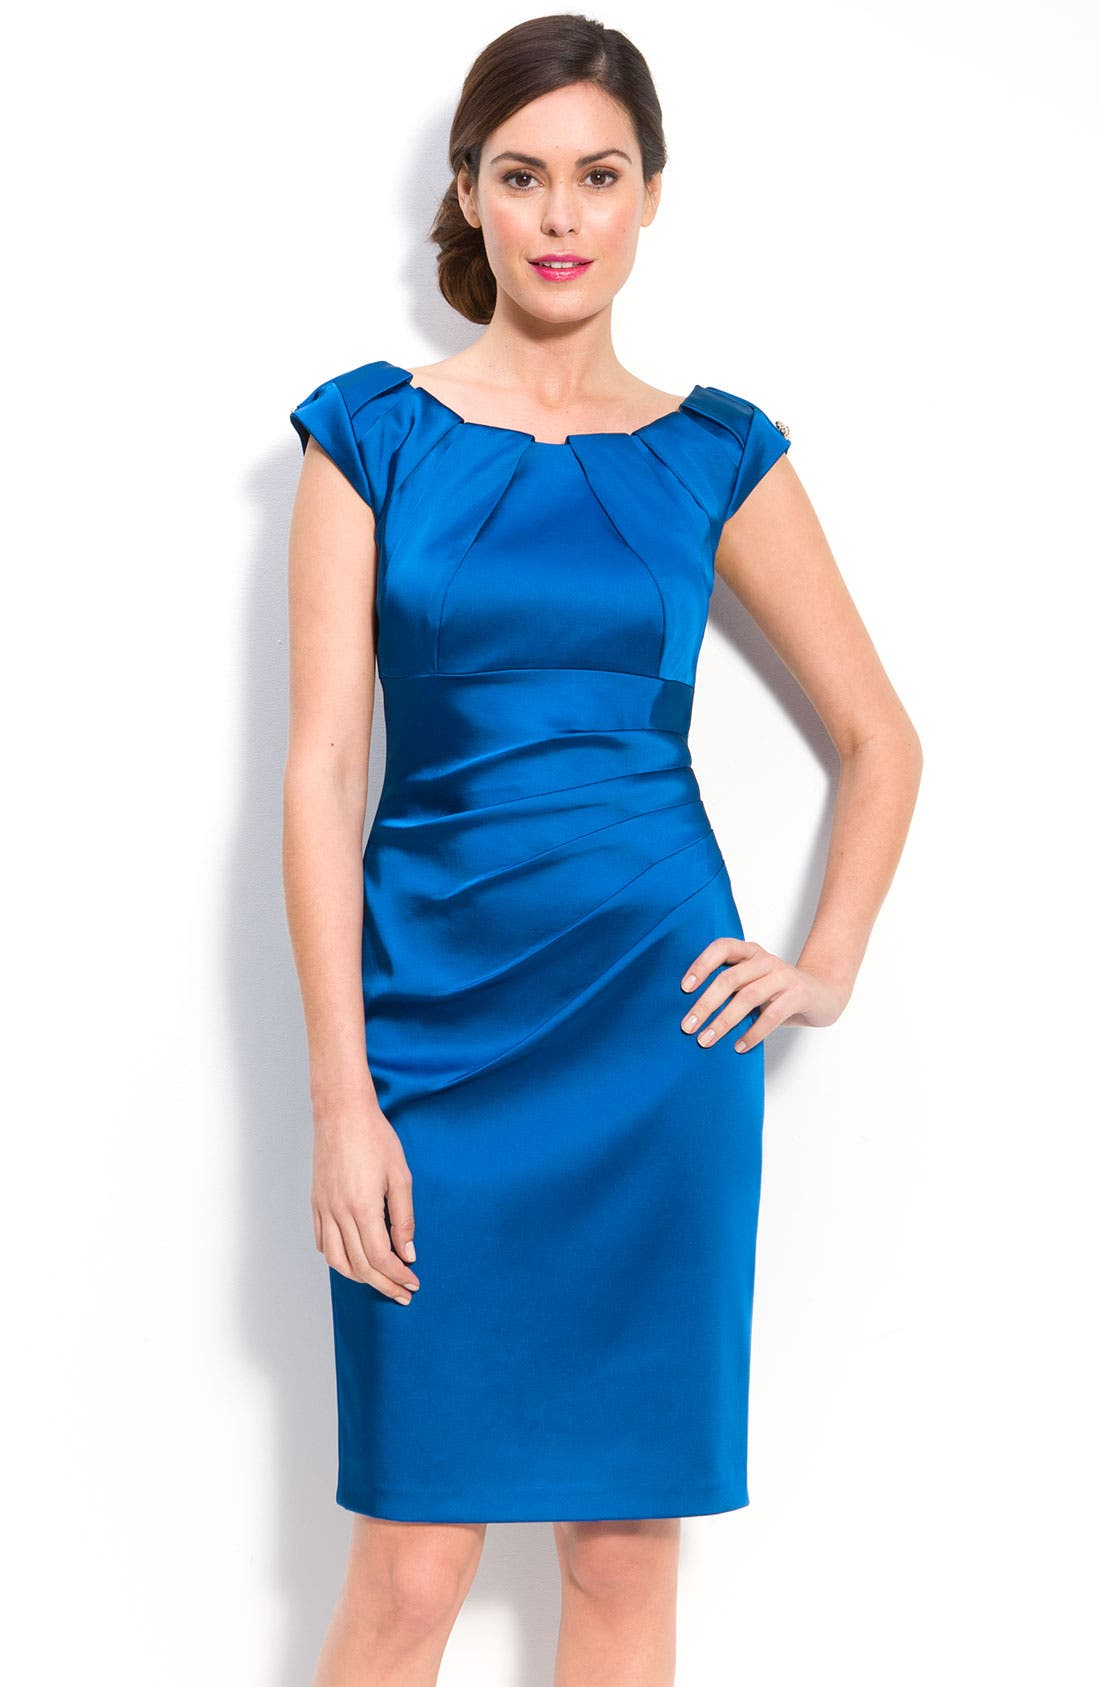 Pleat Neck Stretch Satin Sheath Dress, Main, color, 460